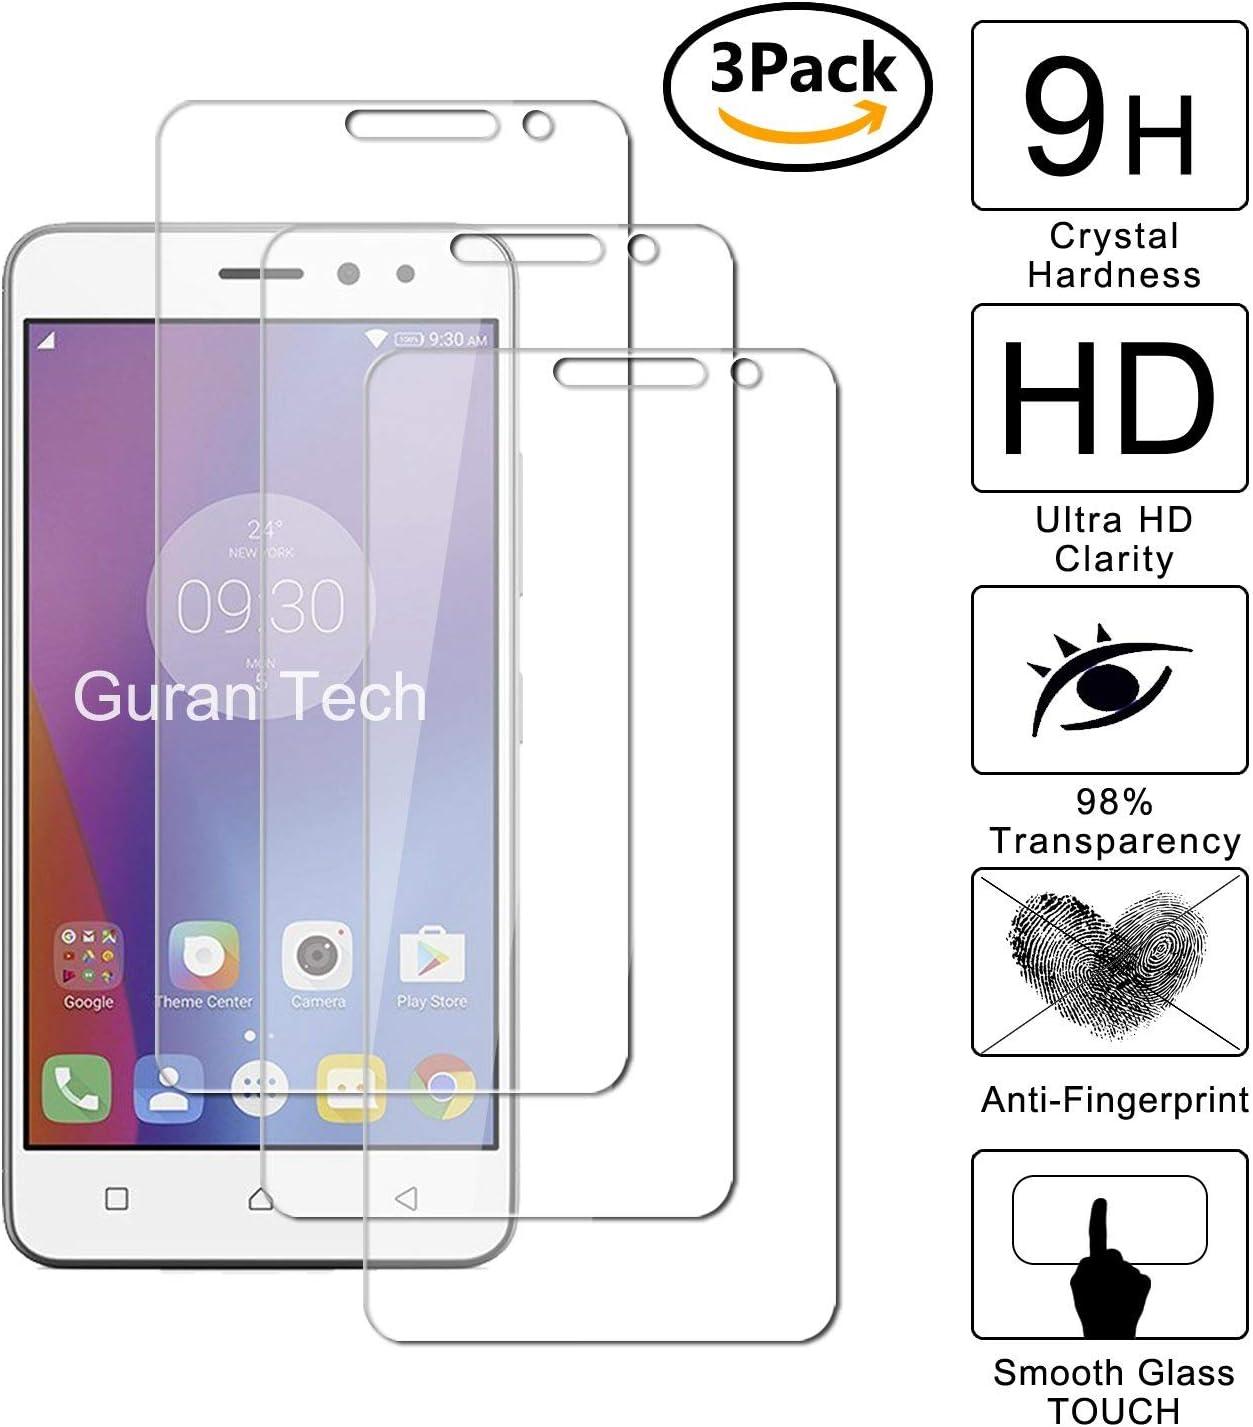 Guran [3-Unidades] Protector de Pantalla Vidrio Cristal Templado para Lenovo K6 Smartphone Cristal Vidrio Templado Film (9H, 2.5D Edge, 0.3mm): Amazon.es: Electrónica